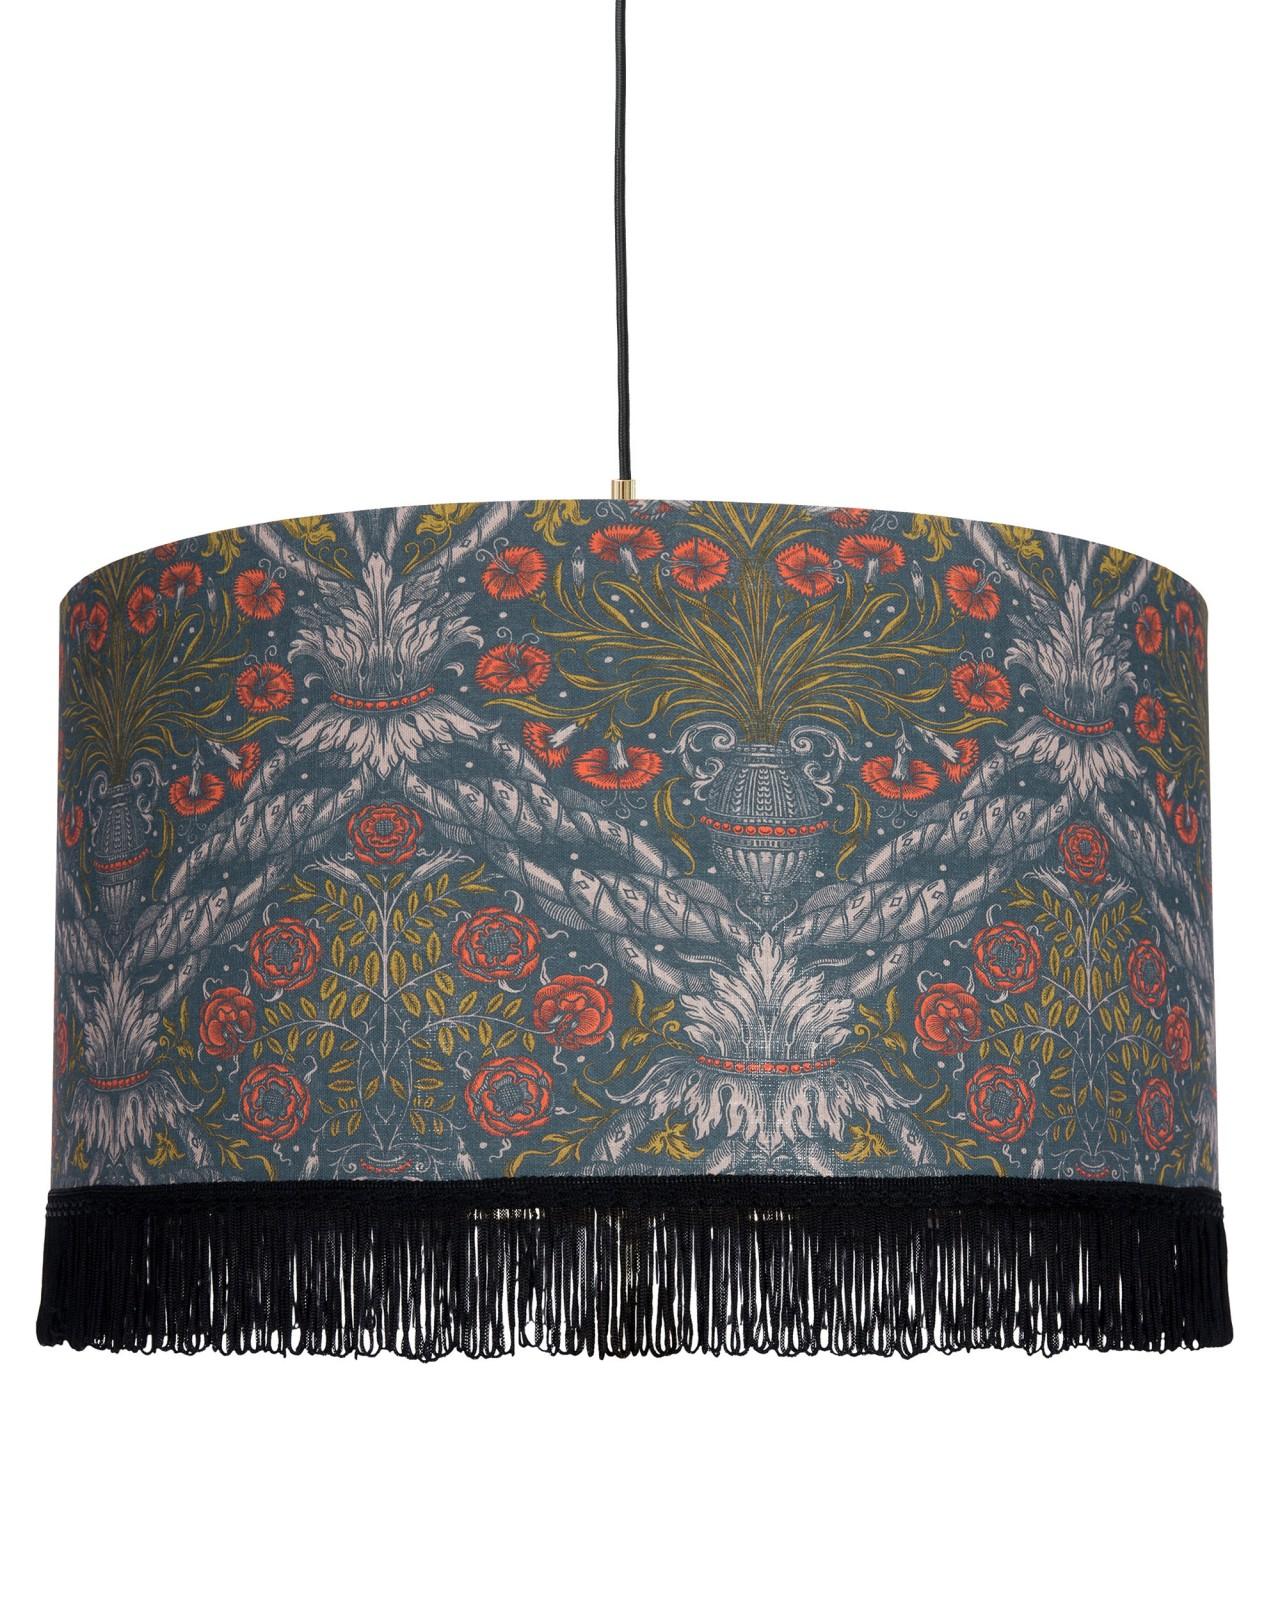 DECORATIVE PANEL Pendant Lamp